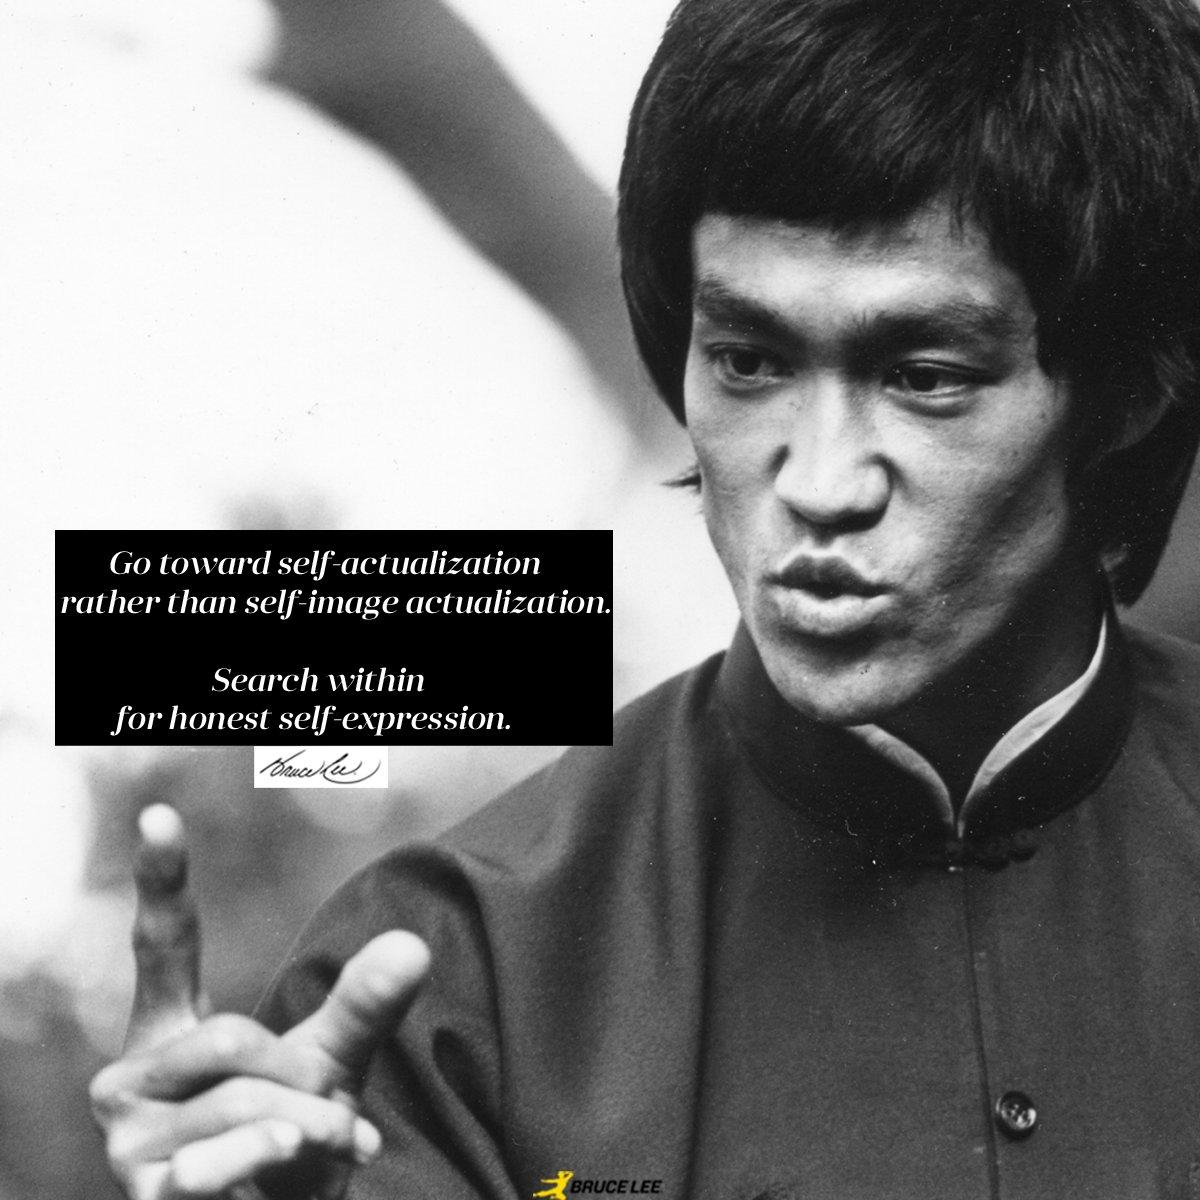 "Bruce Lee on Twitter: """"Go toward self-actualization ..."